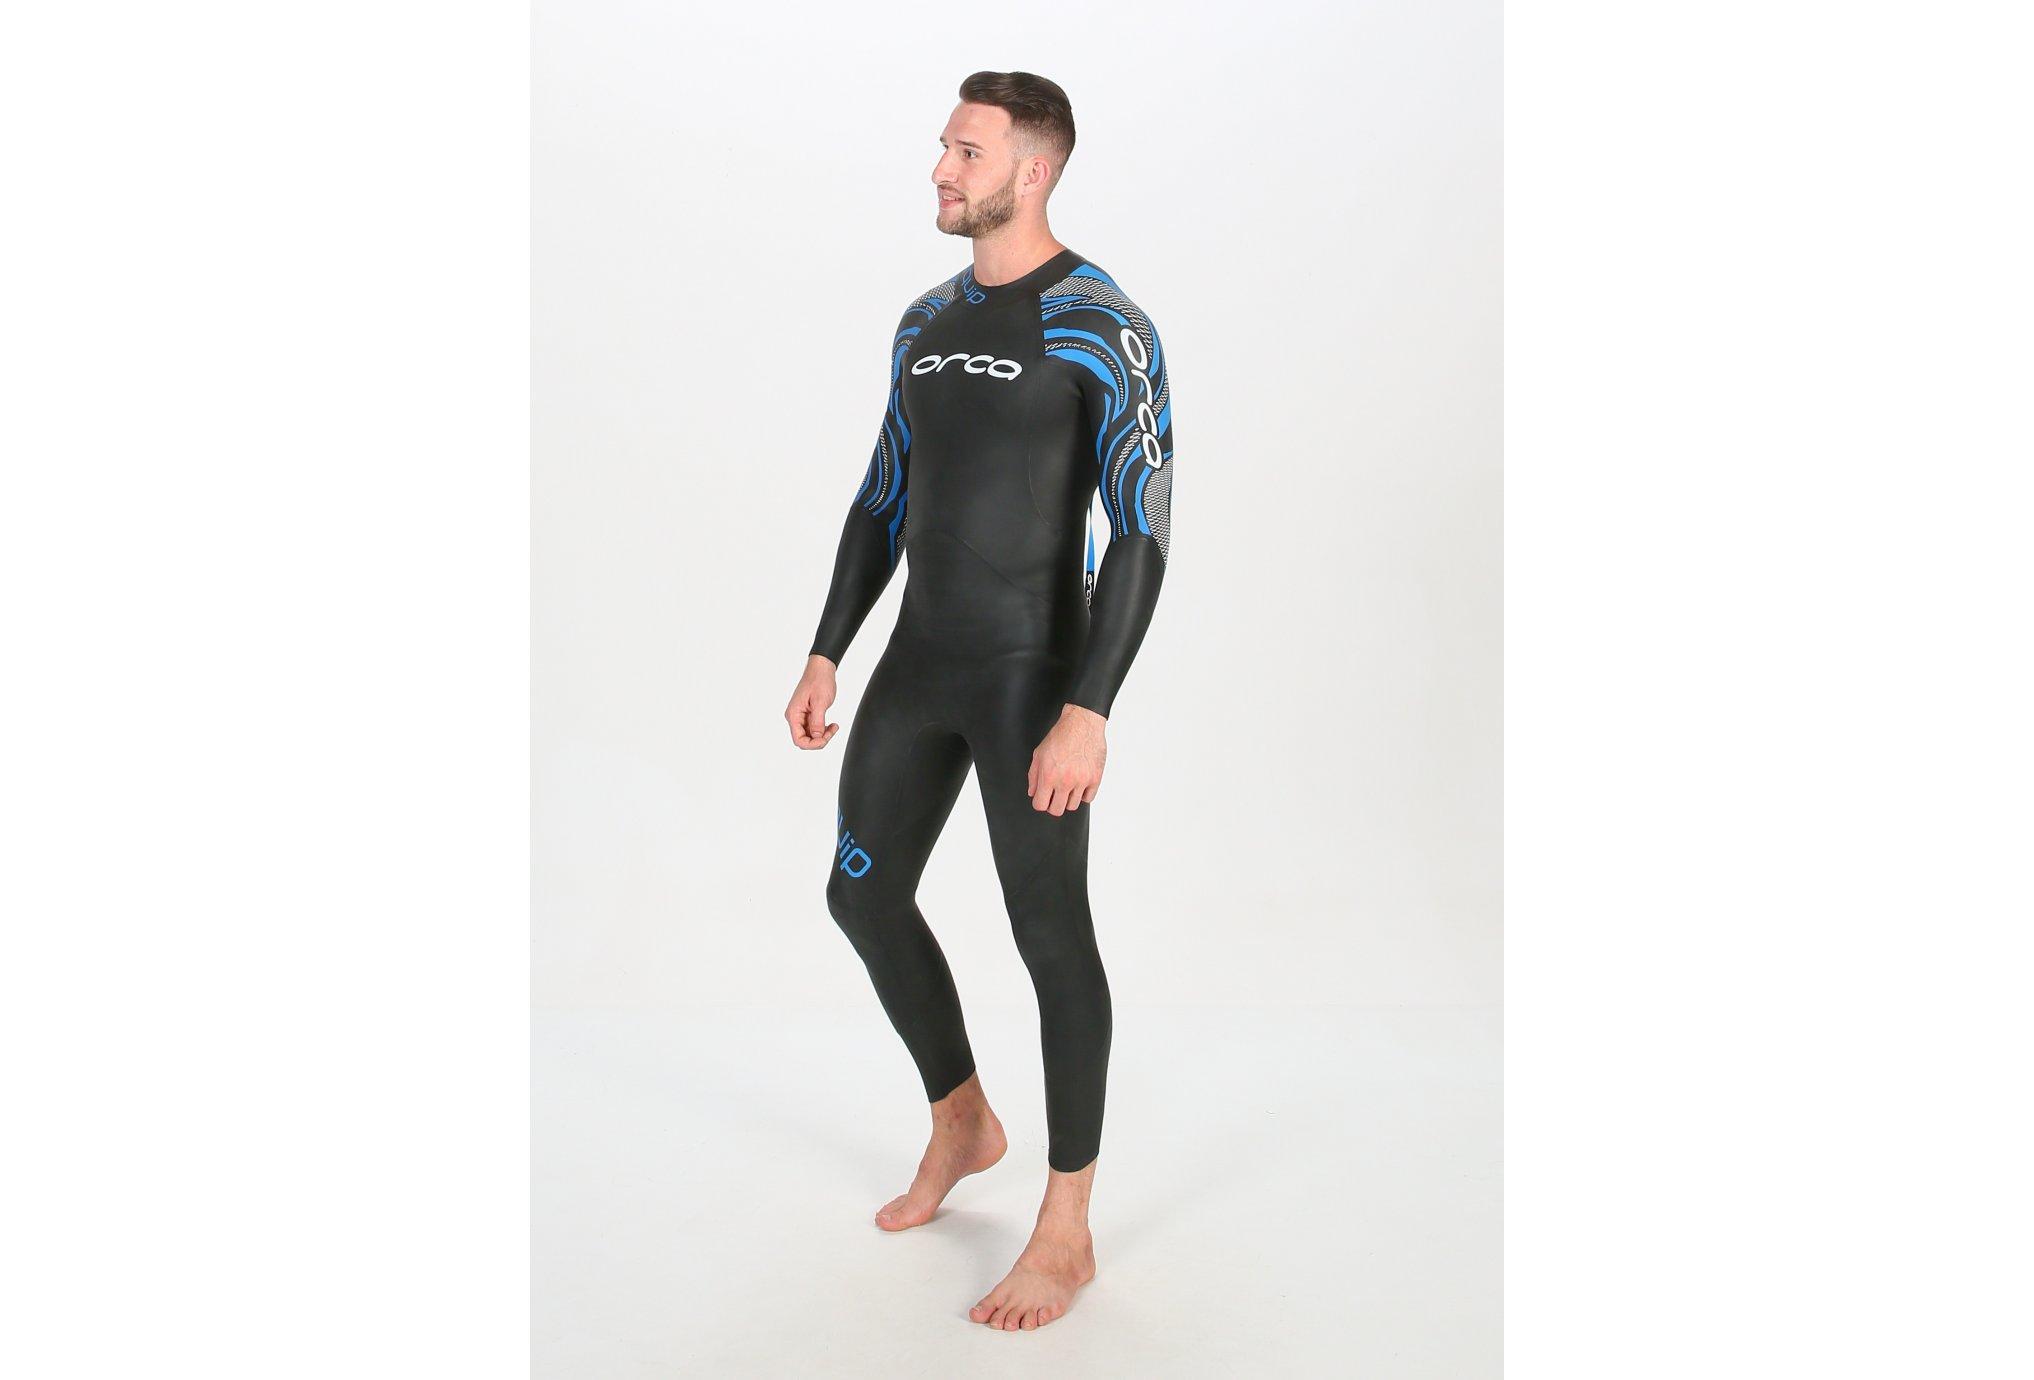 Orca Equip Wetsuit M vêtement running homme